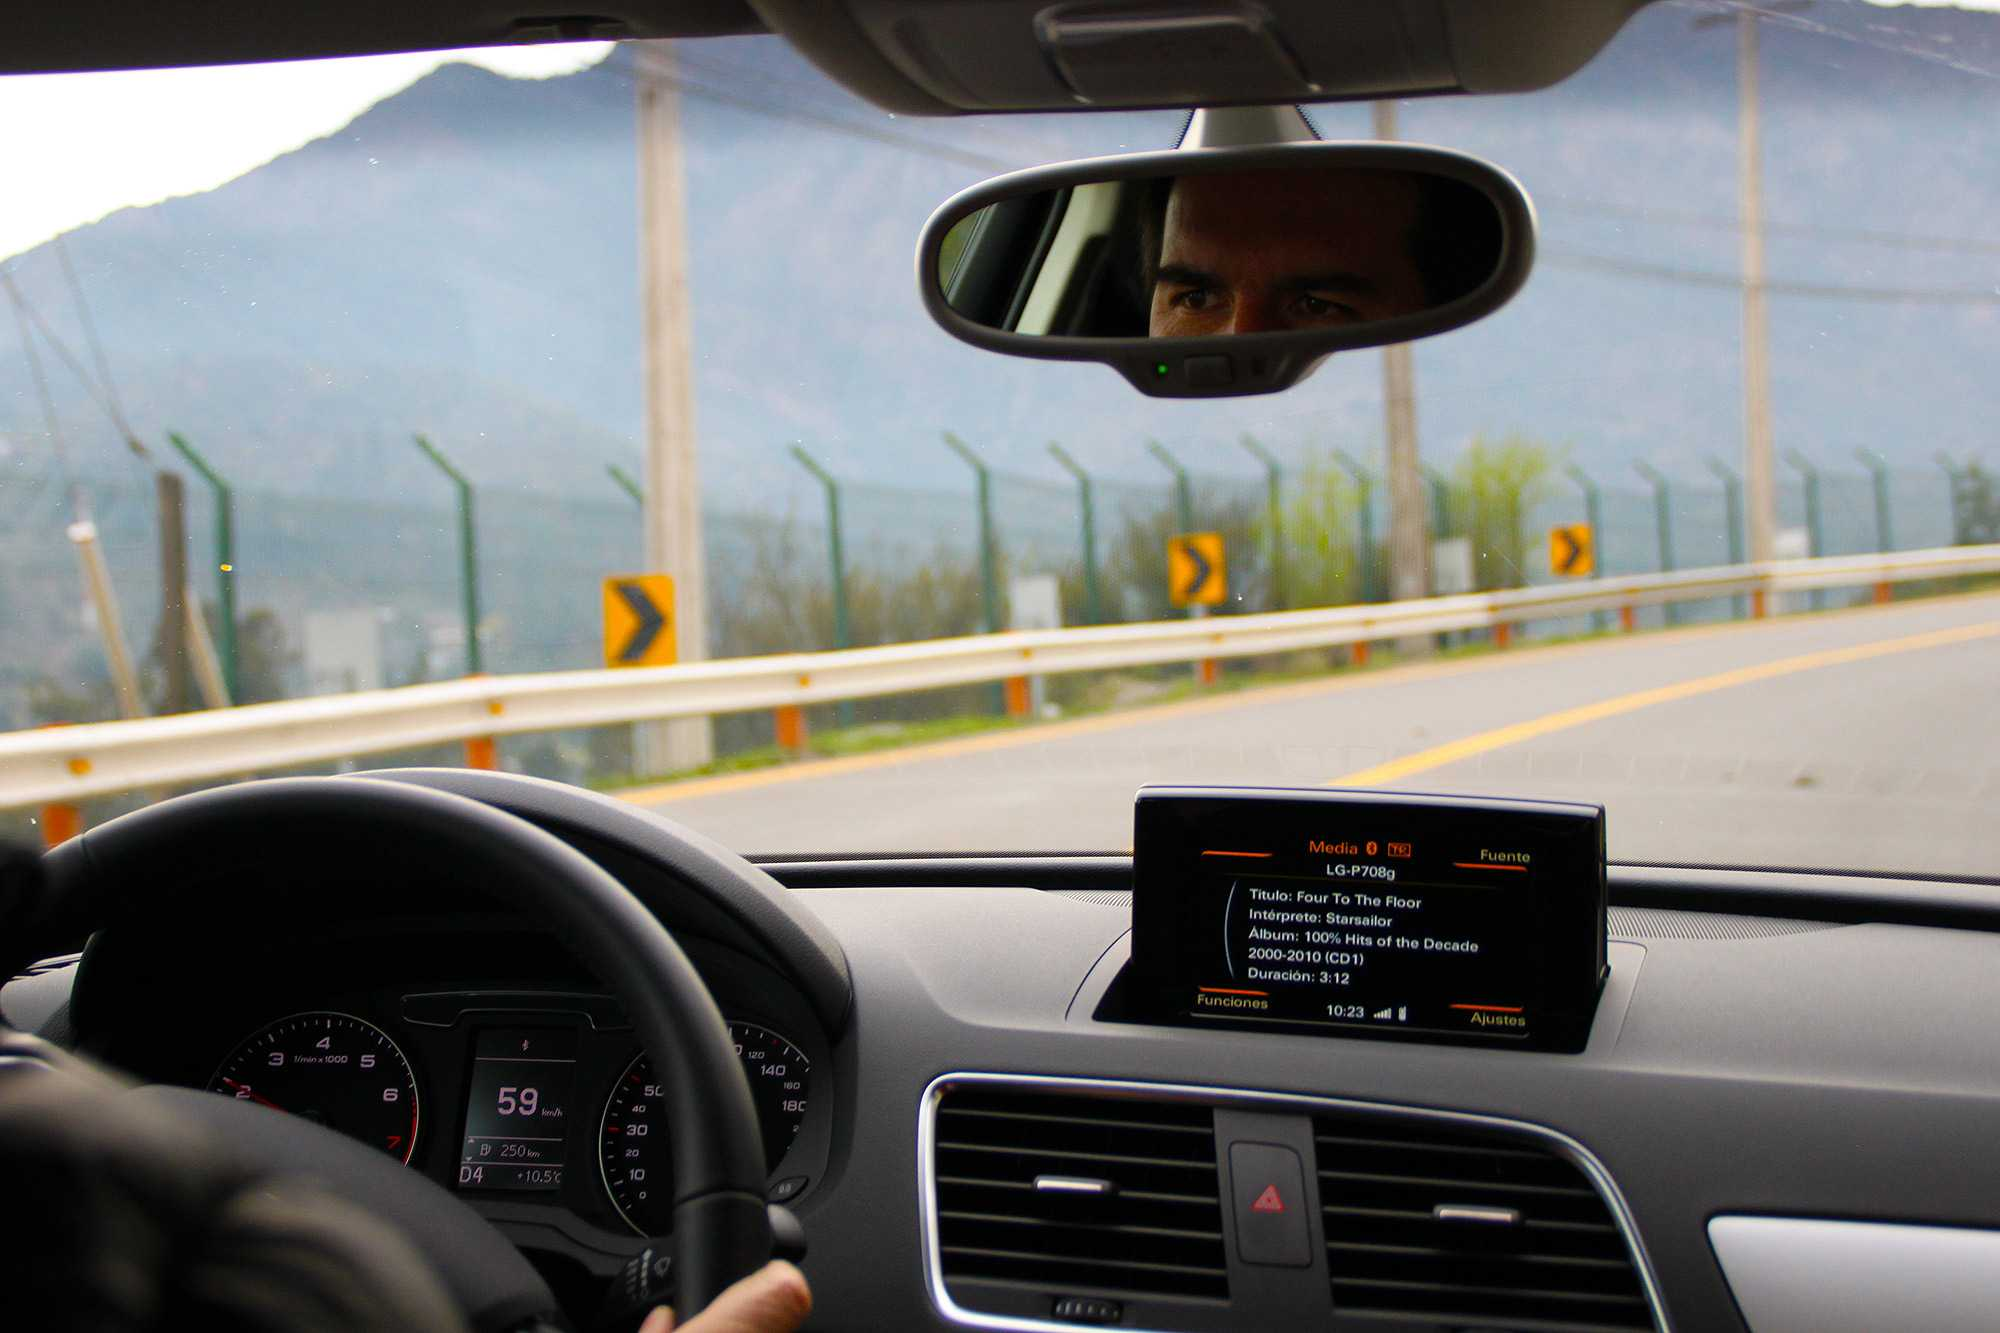 audi-q3-1-4t-2016-test-drive-rutamotor-1